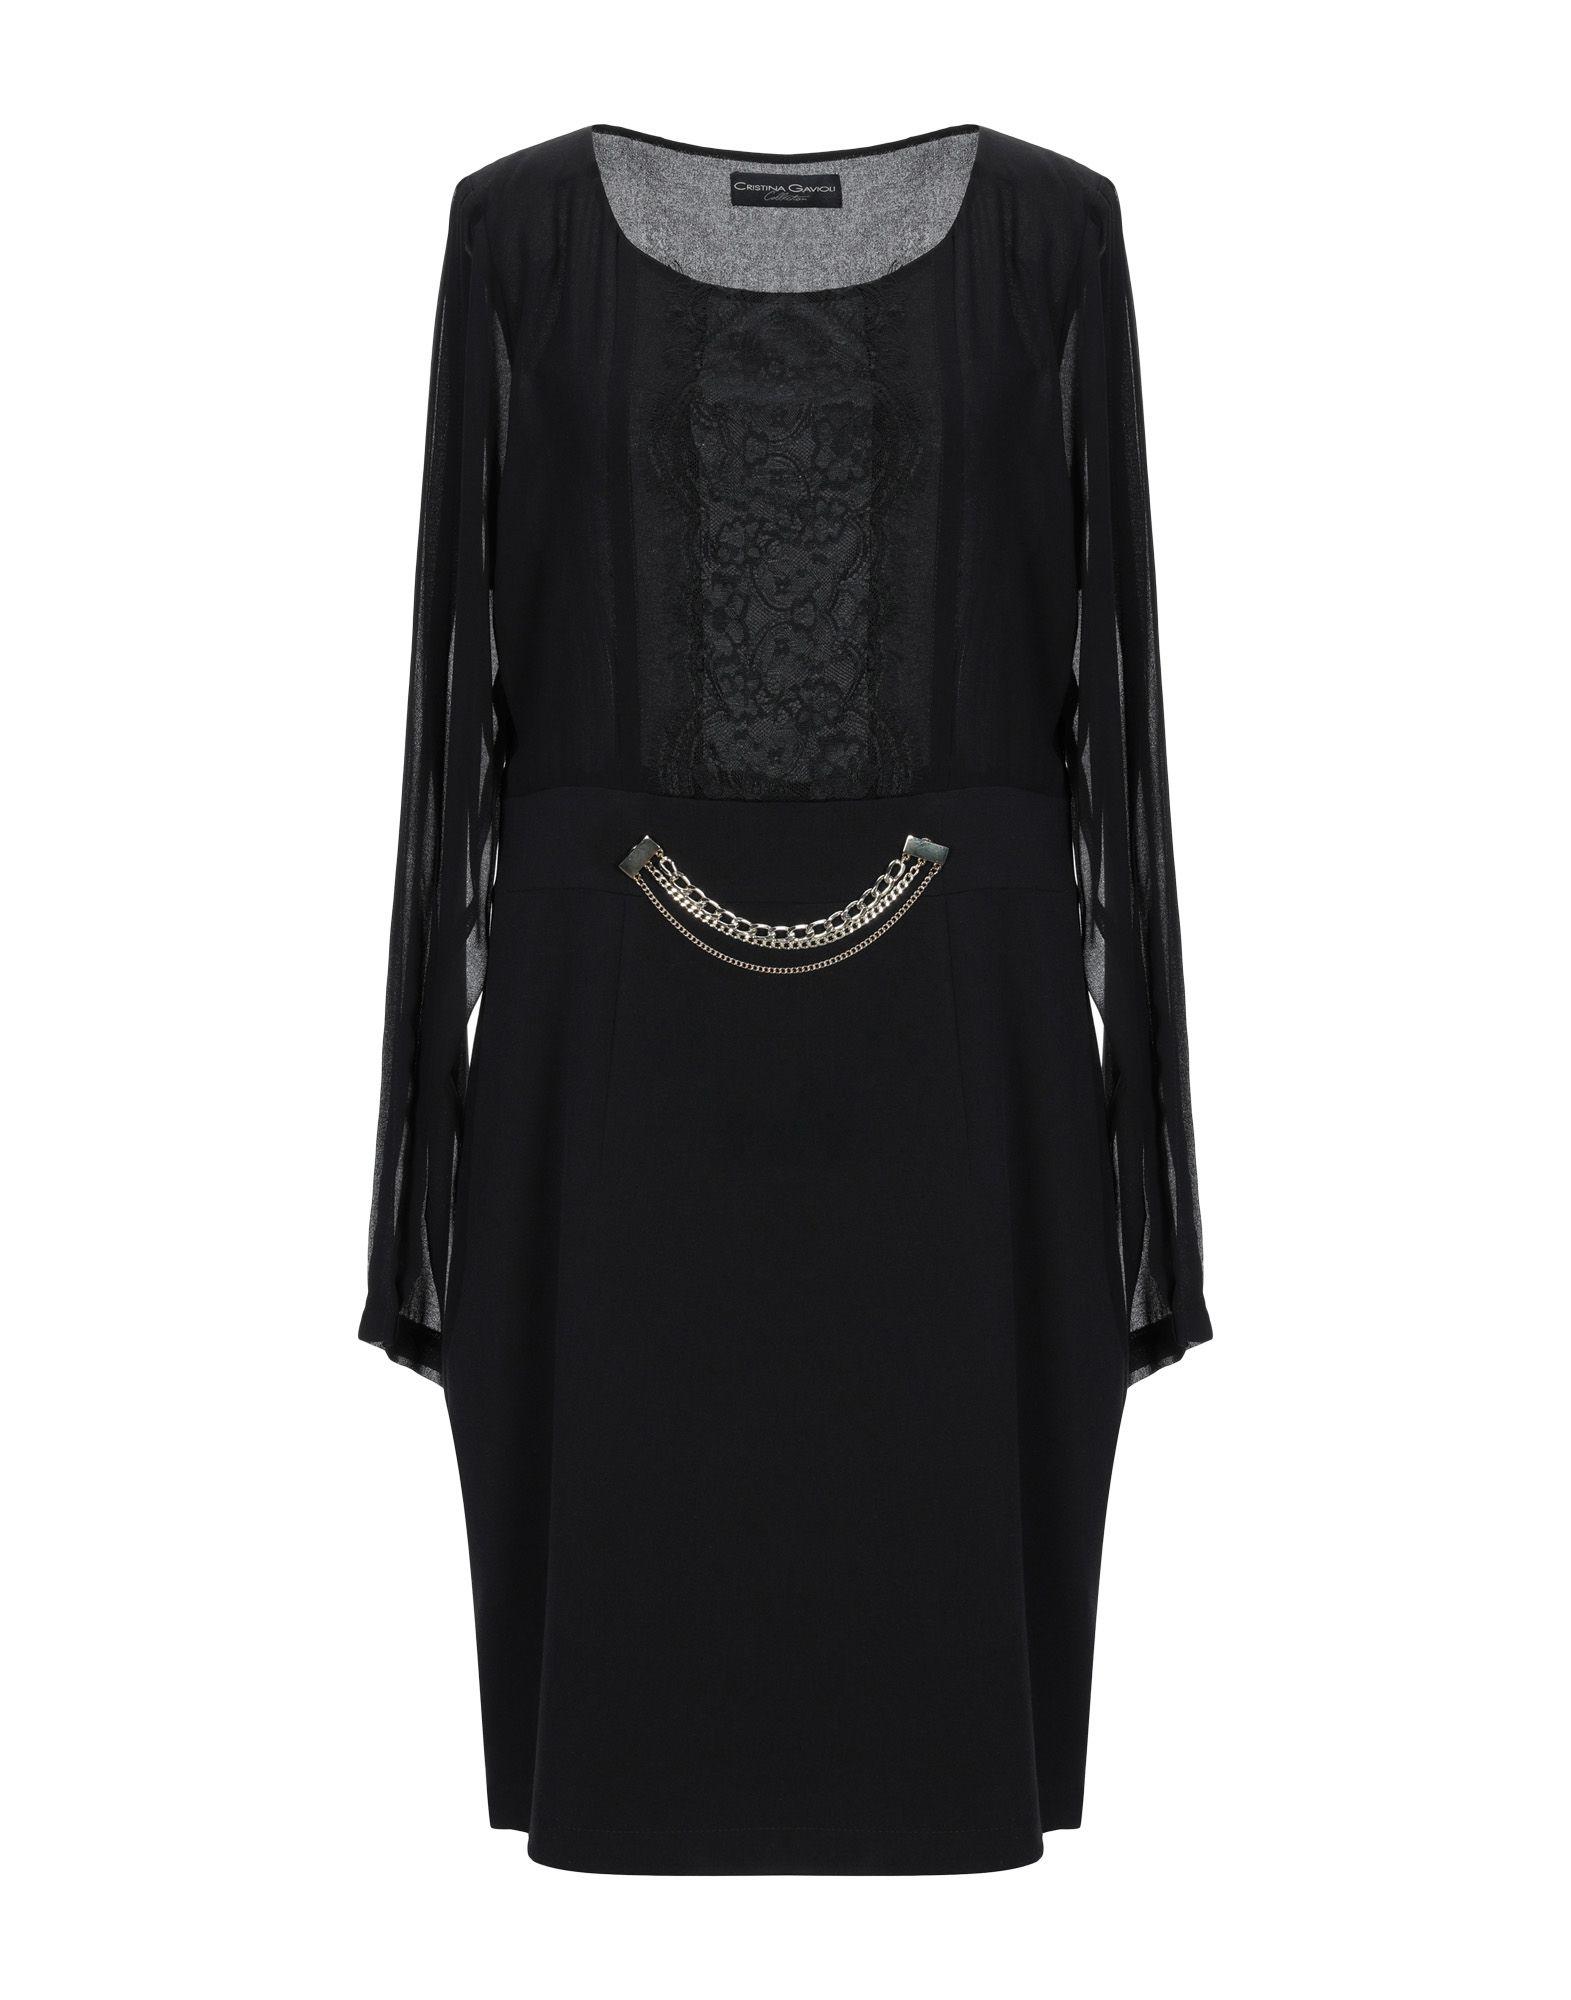 CRISTINA GAVIOLI COLLECTION Короткое платье платье cristina gavioli платья и сарафаны мини короткие